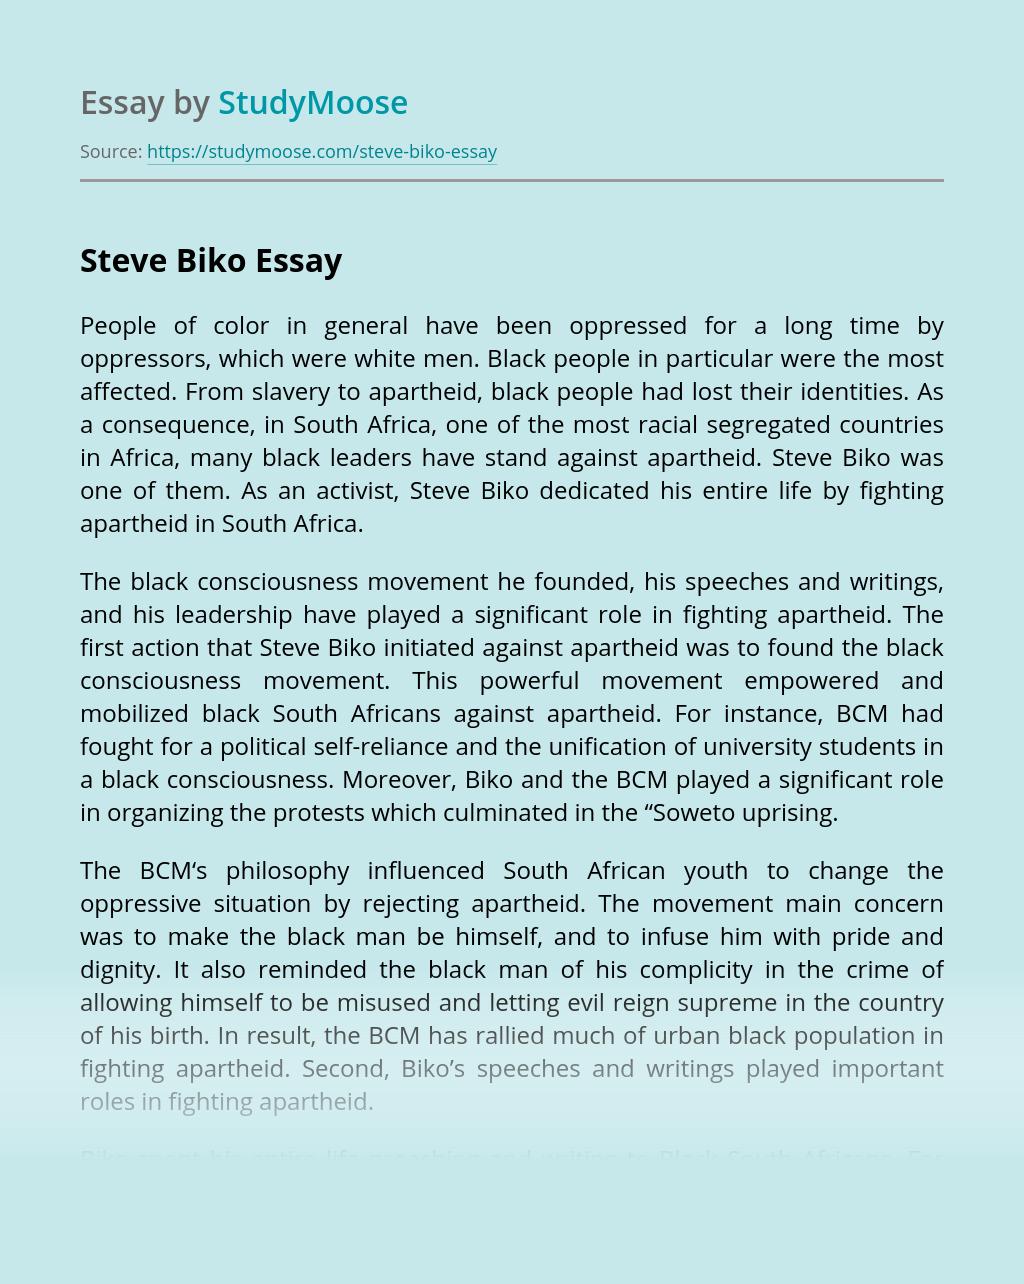 Steve Biko Biography and Life